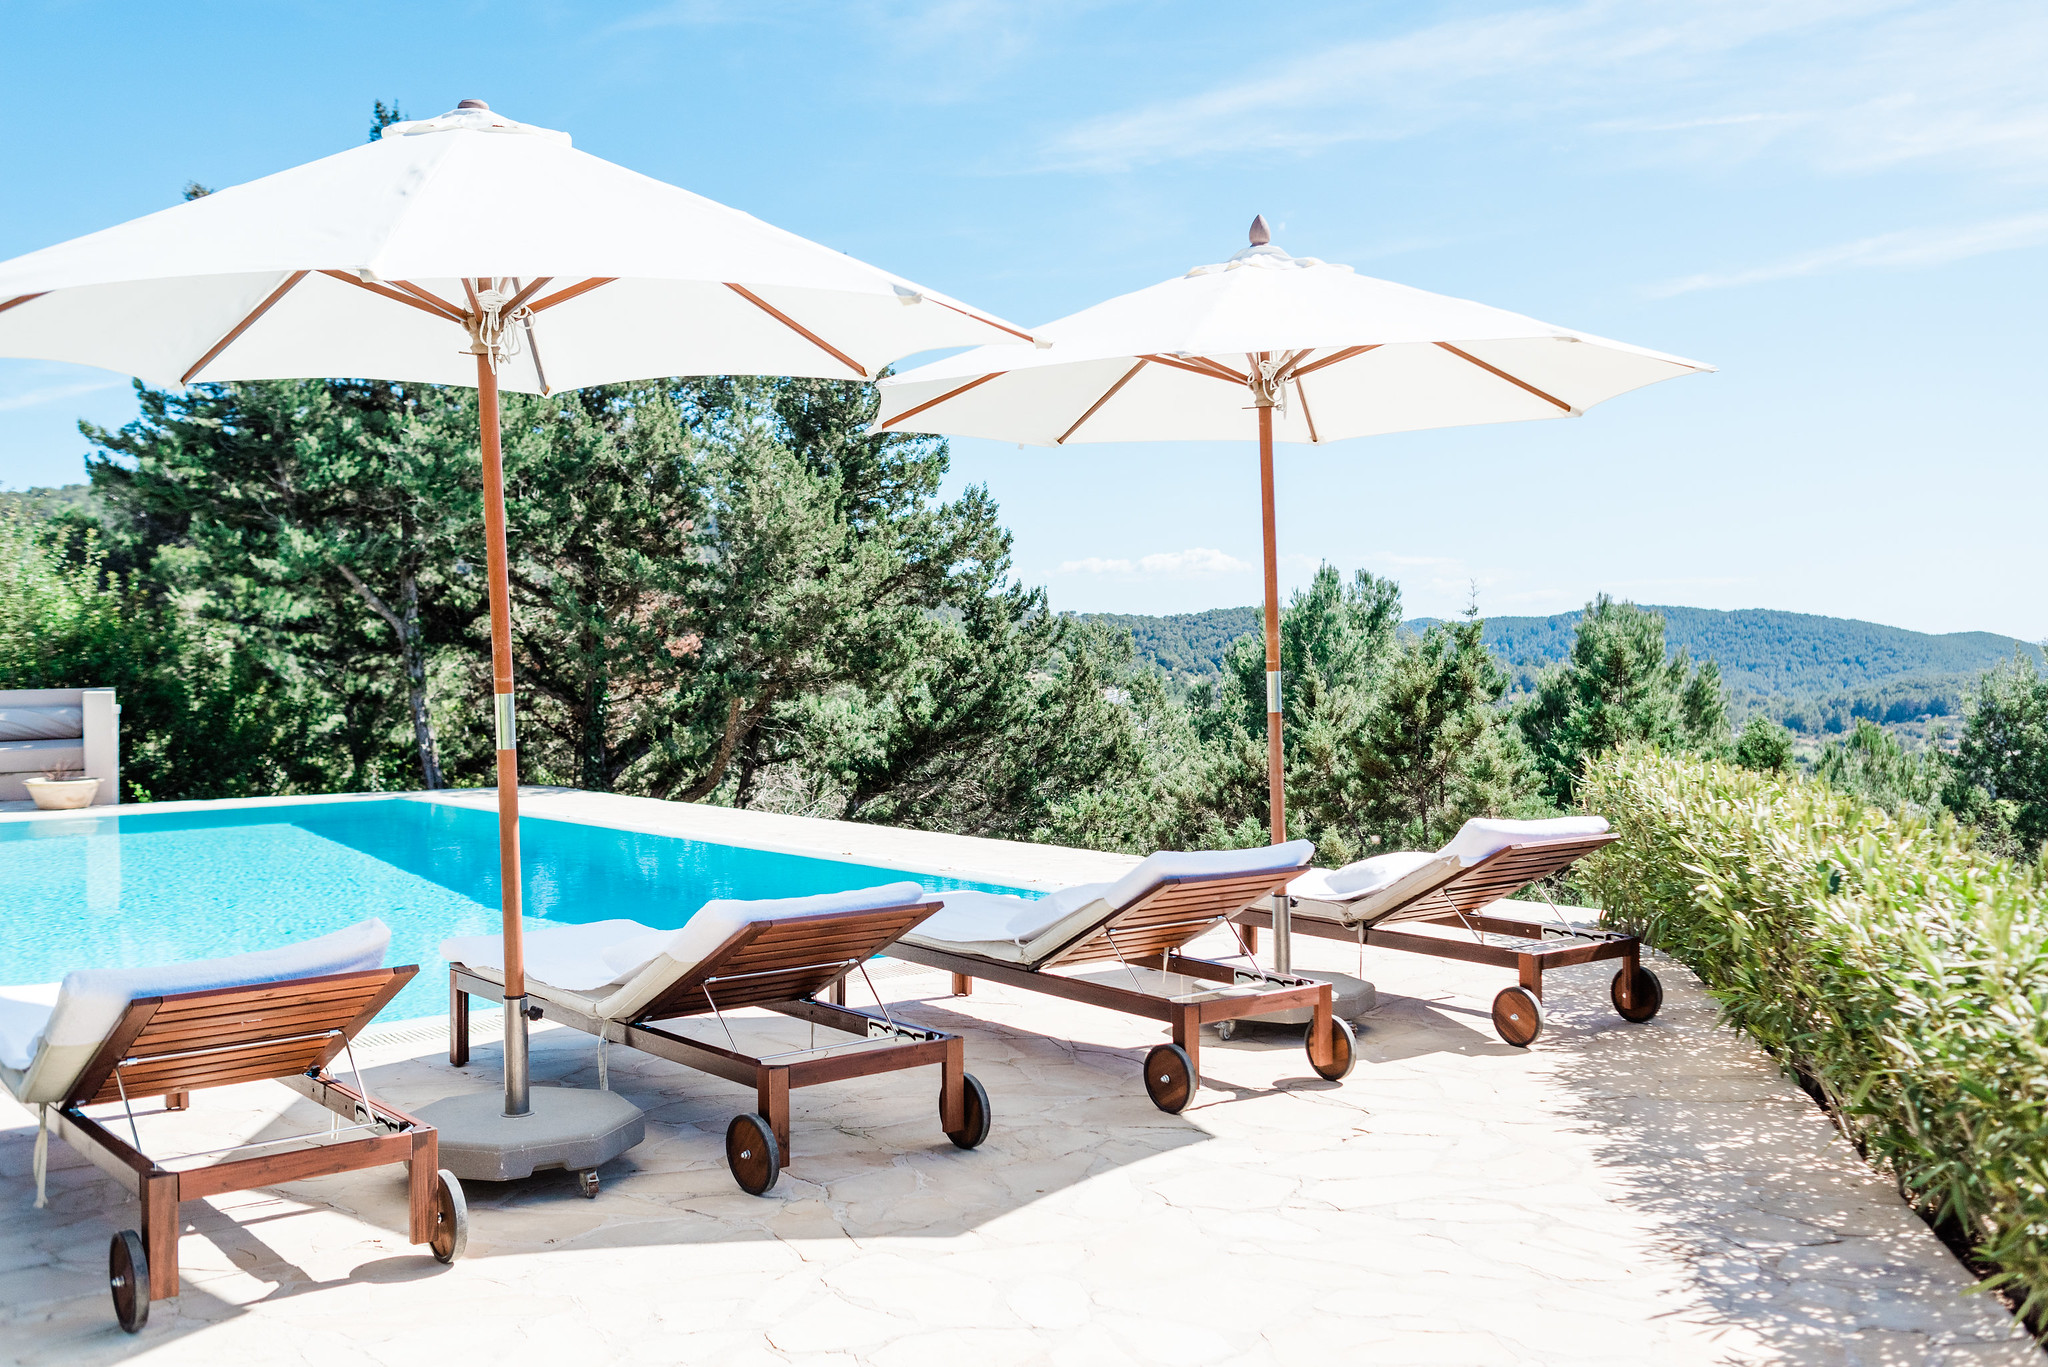 https://www.white-ibiza.com/wp-content/uploads/2020/06/white-ibiza-villas-villa-andrea-exterior-sunloungers3.jpg